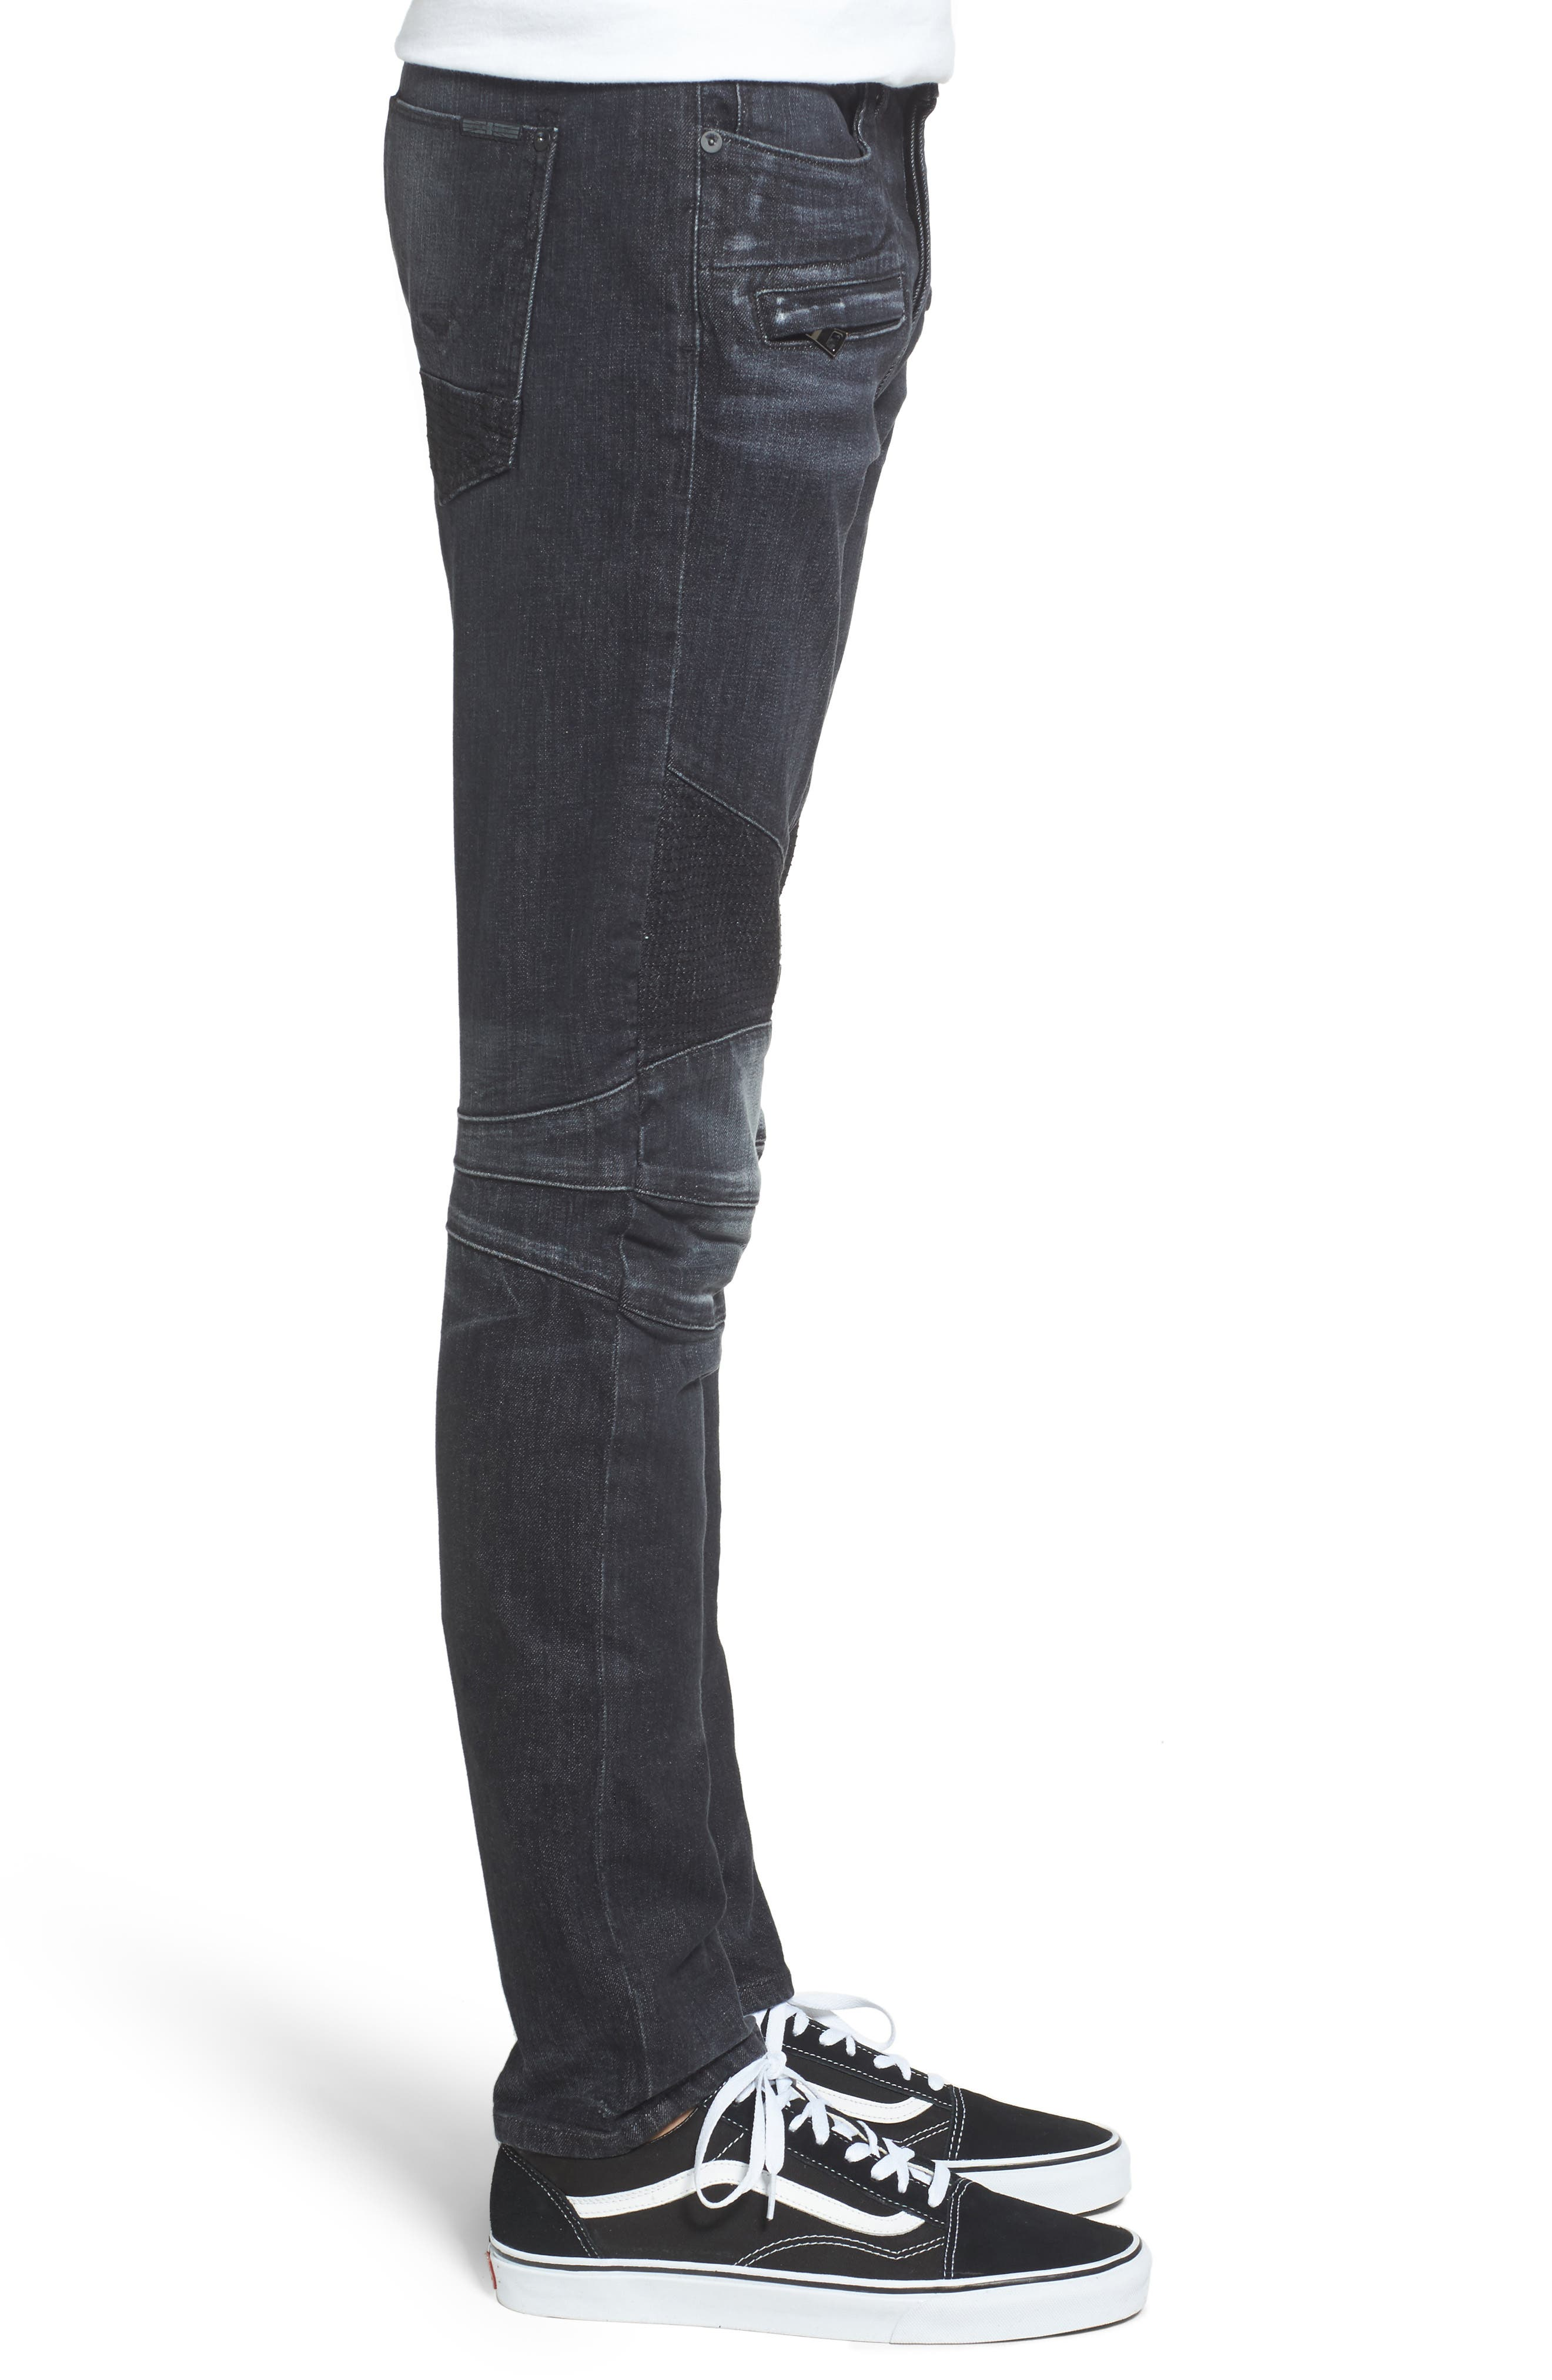 Blinder Skinny Fit Moto Jeans,                             Alternate thumbnail 3, color,                             001